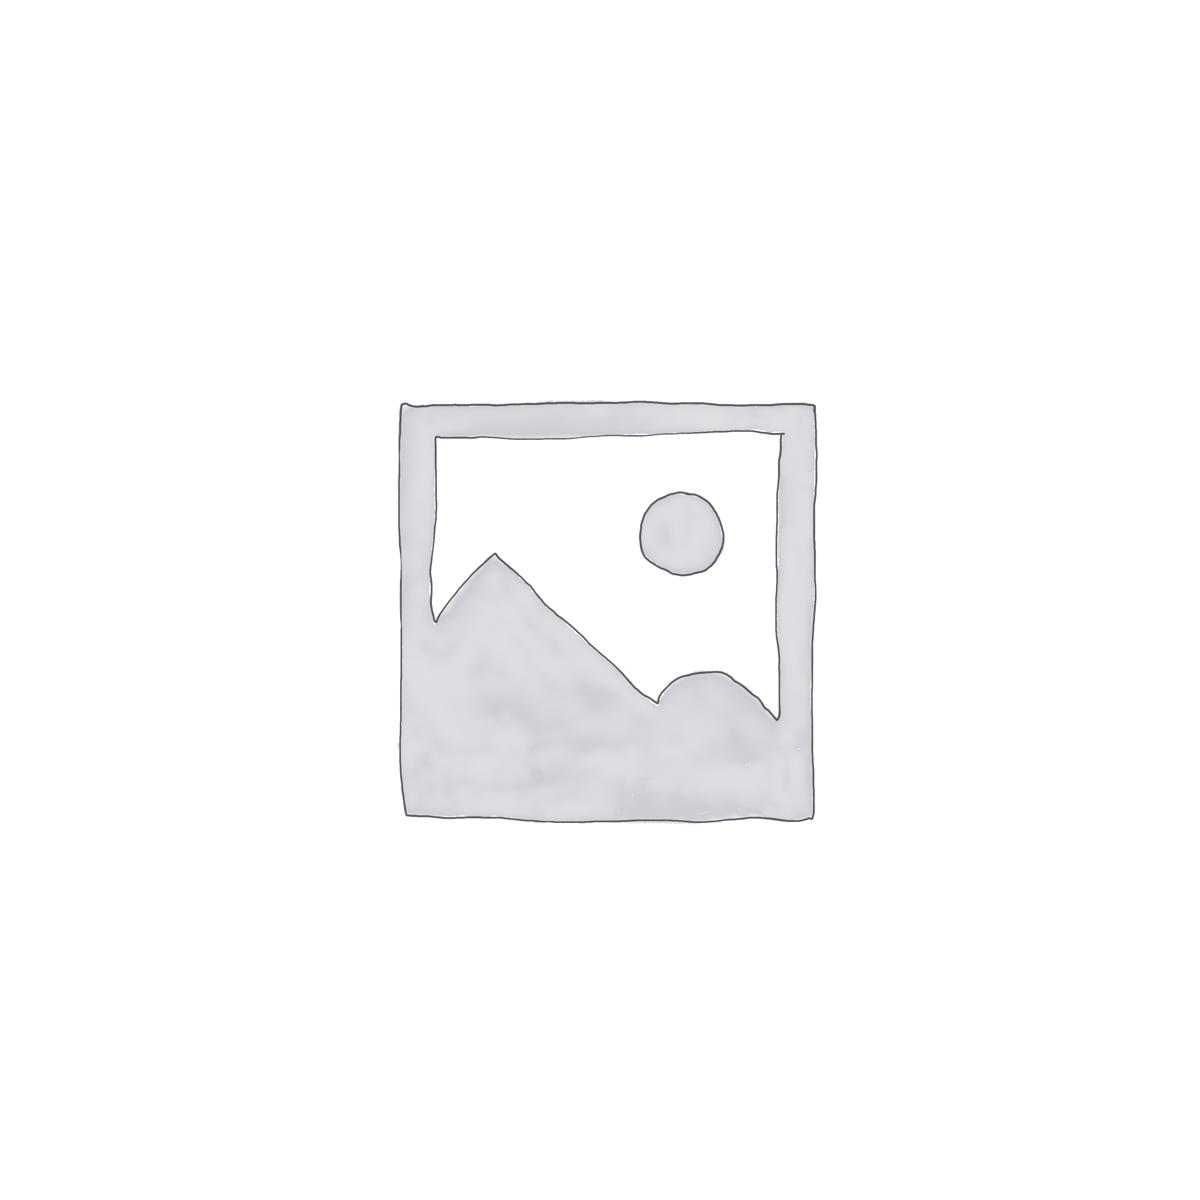 Exotic Palm Tree Landscape Wallpaper Mural